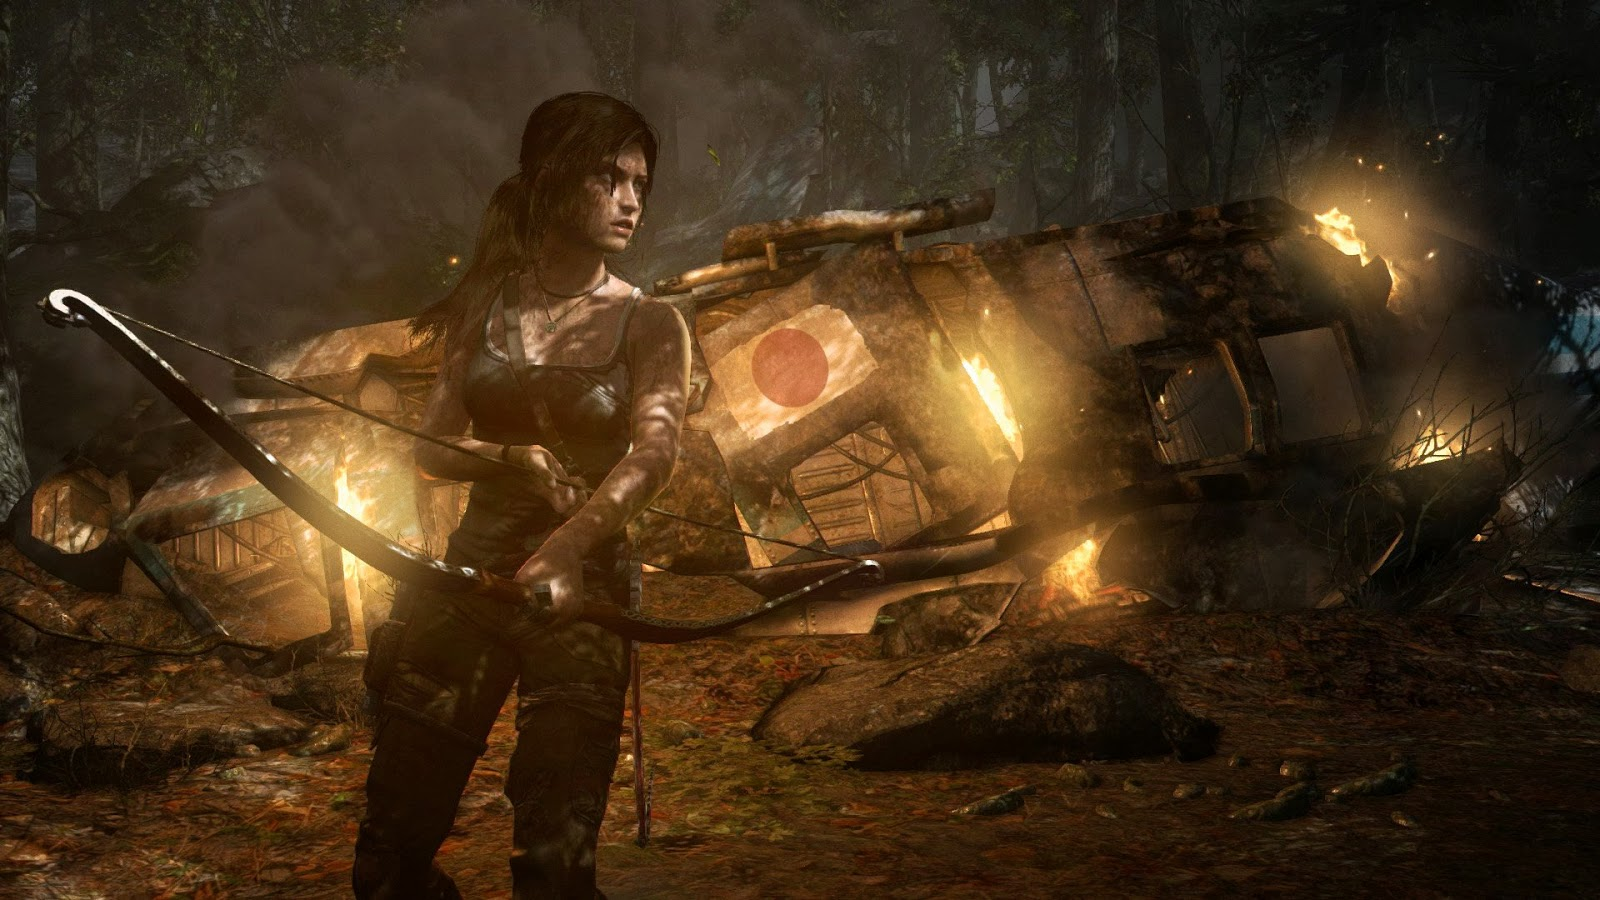 Programa 7x18 (14-02-2014) Tomb Raider Definitive Edition Tomb_raider_definitive_edition-2437111